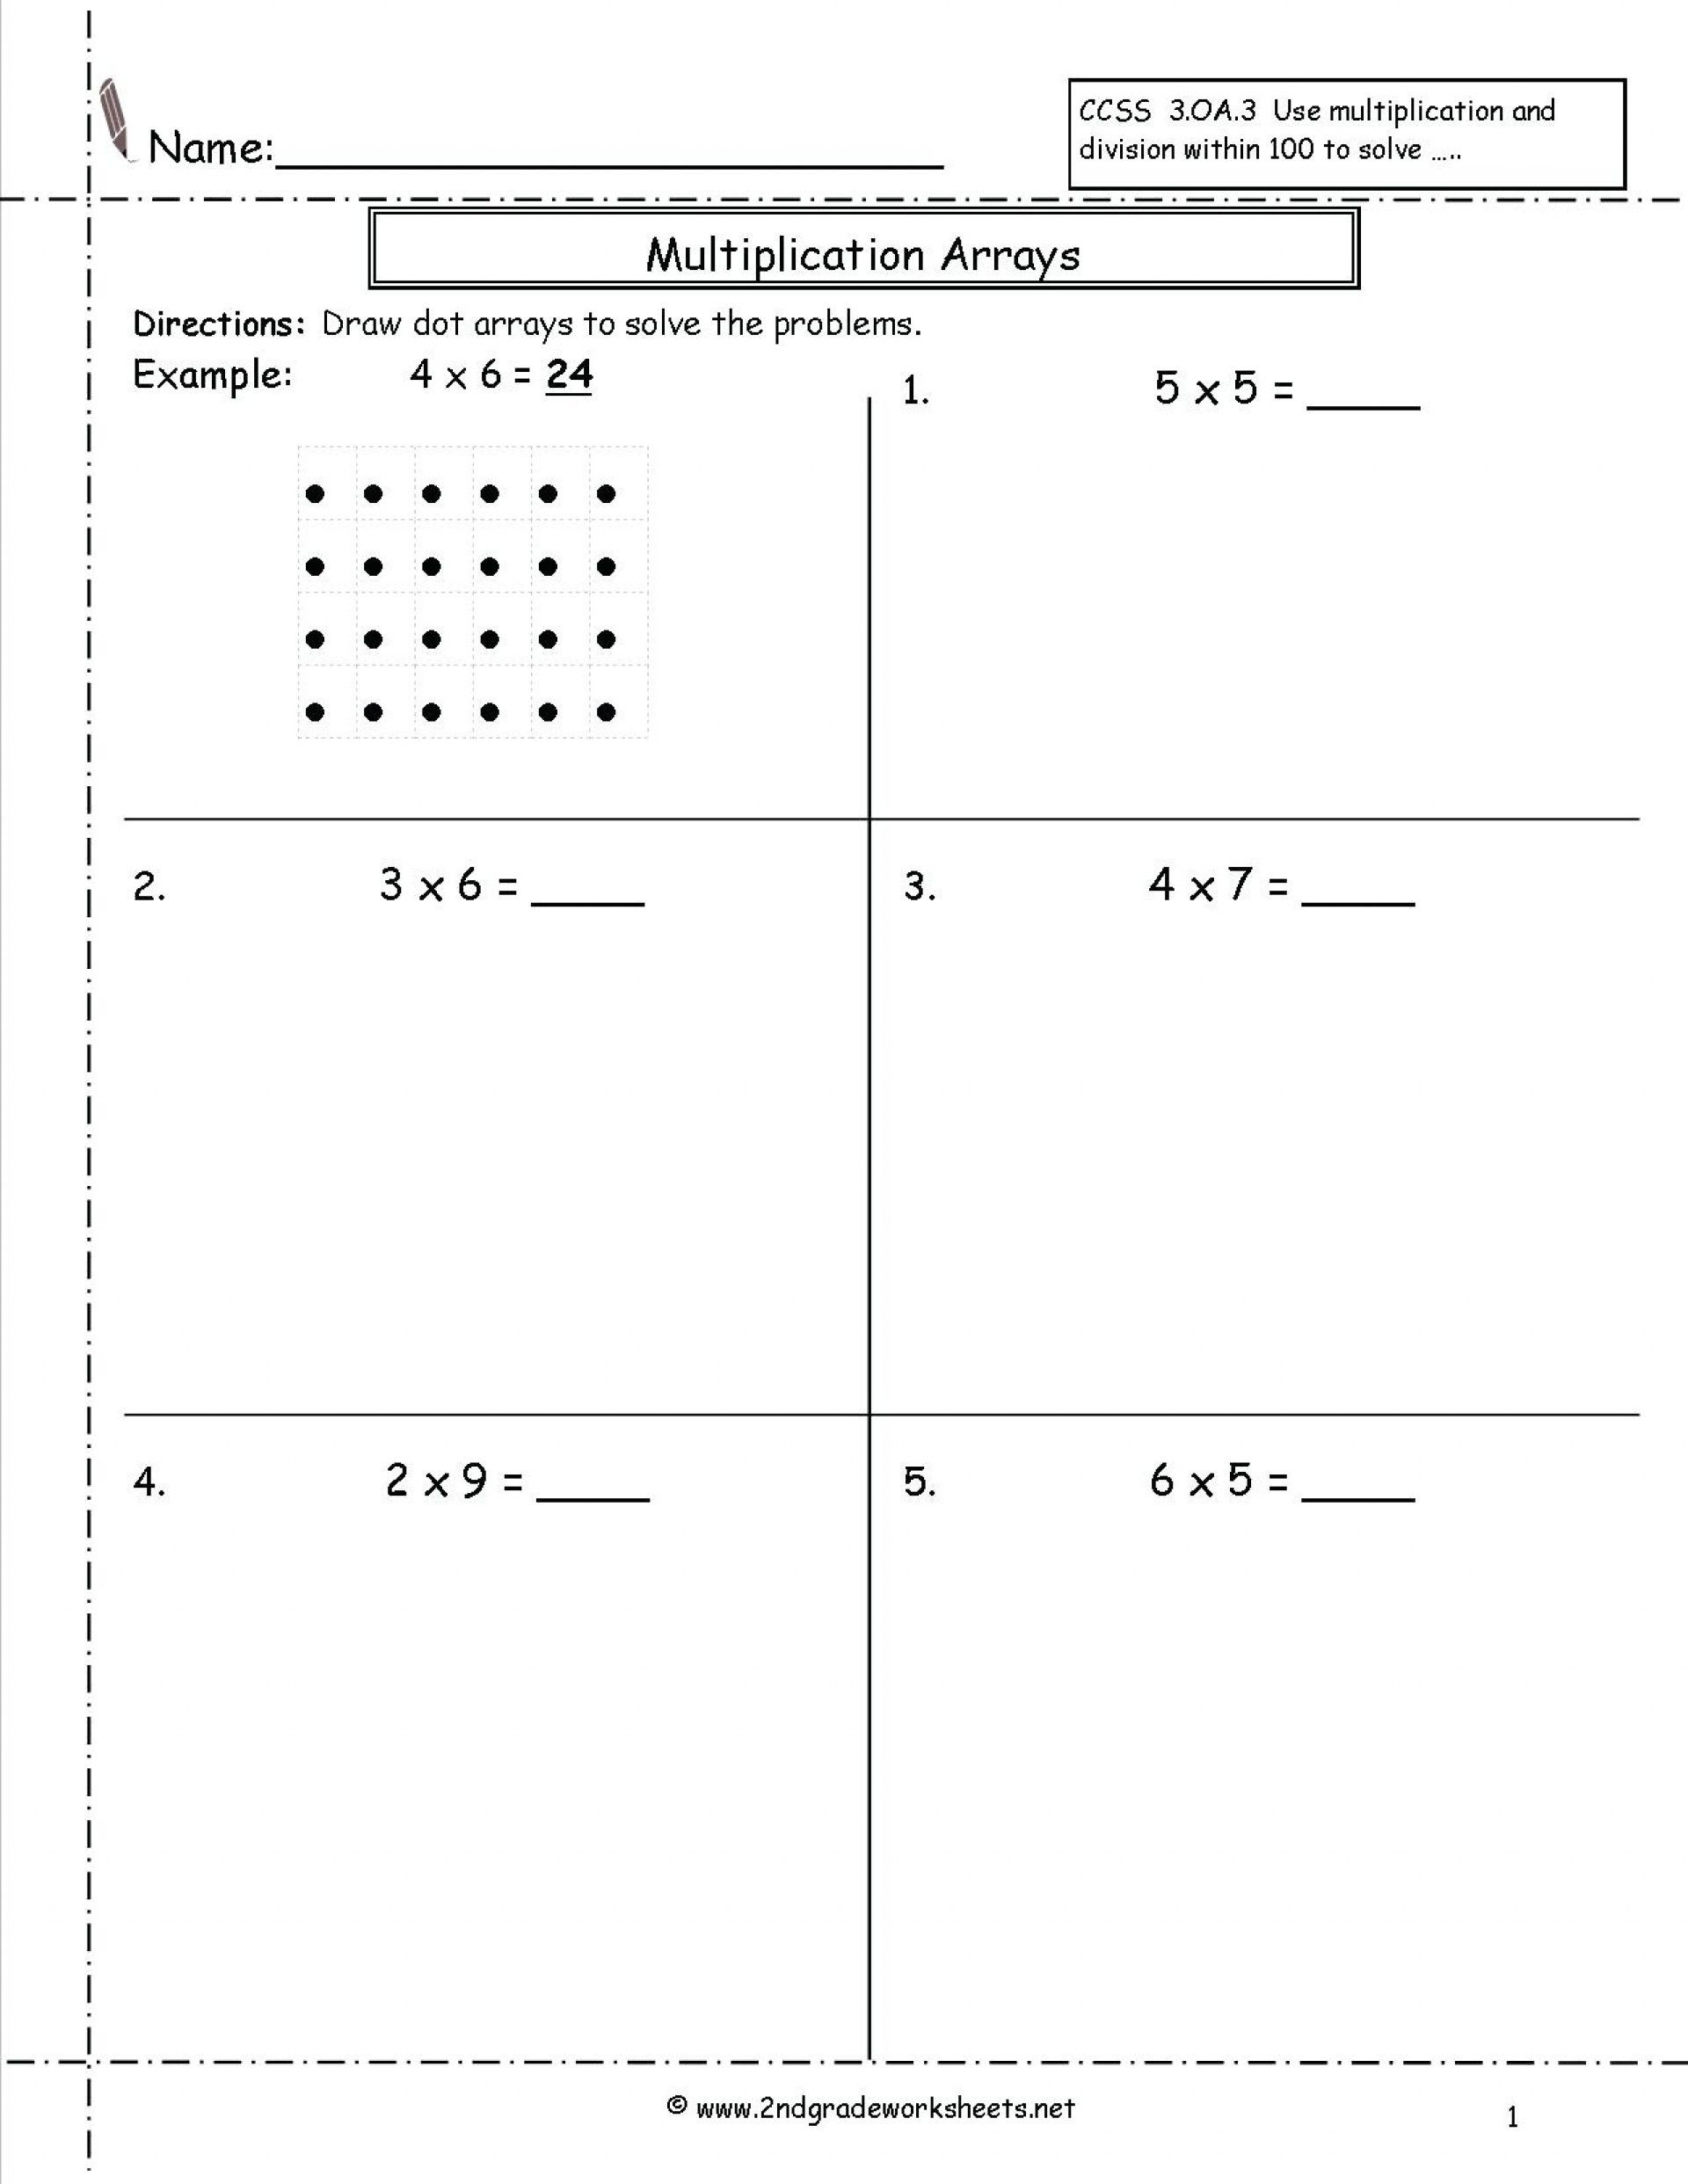 4 Worksheet Free Math Worksheets Third Grade 3 Multiply With Arrays 001 Worksheet Multiplicat Array Worksheets Multiplication Arrays Math Worksheets